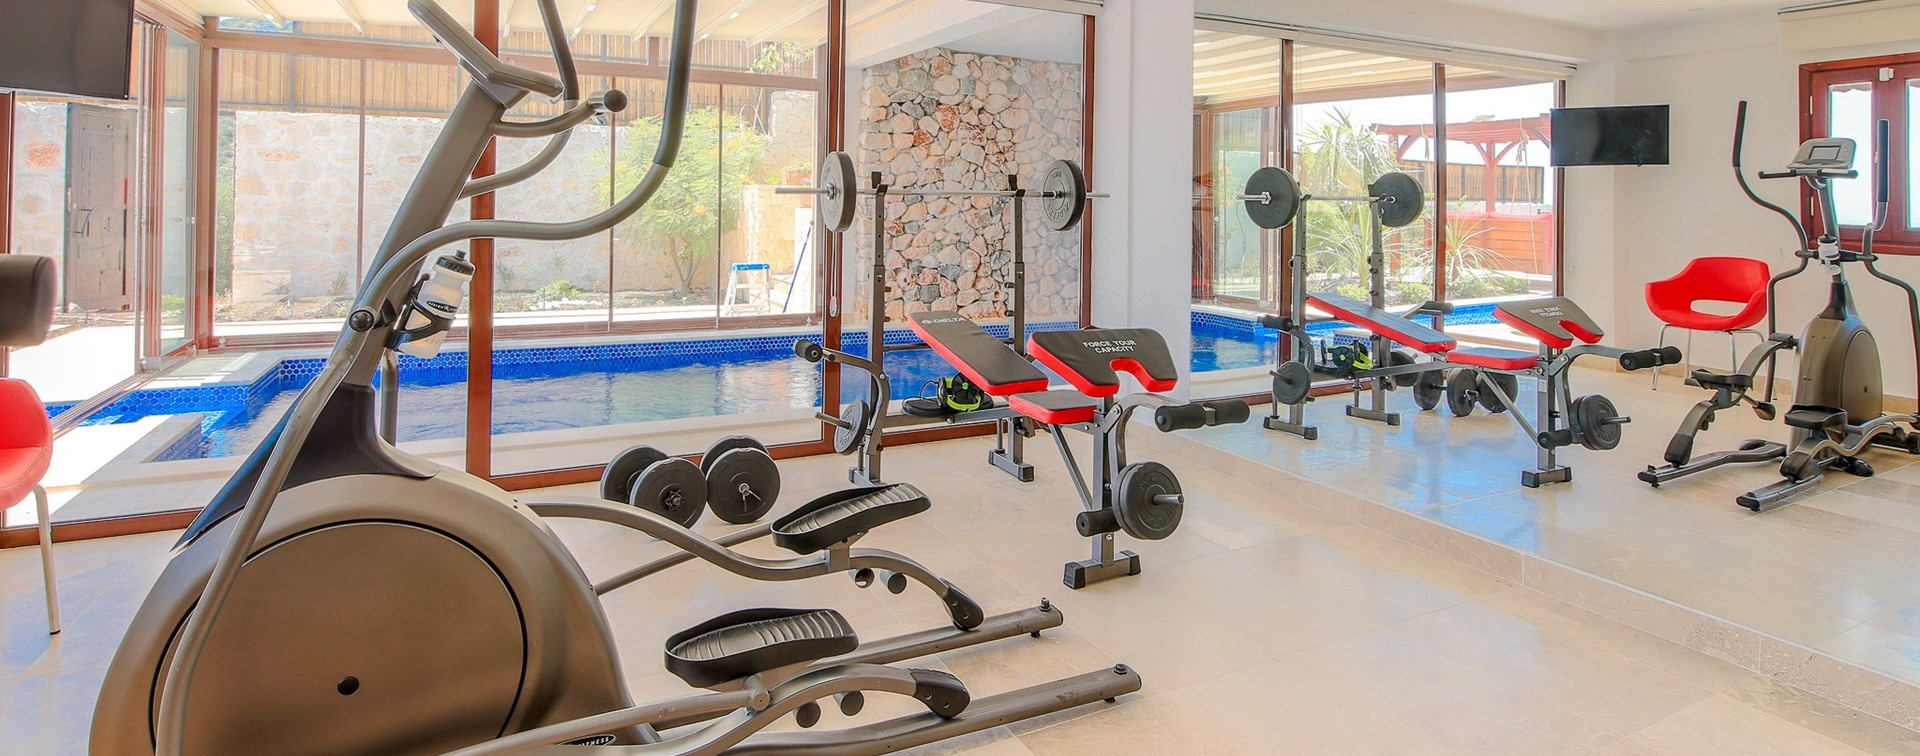 villa-caria-kalkan-indoor-fitness-gym